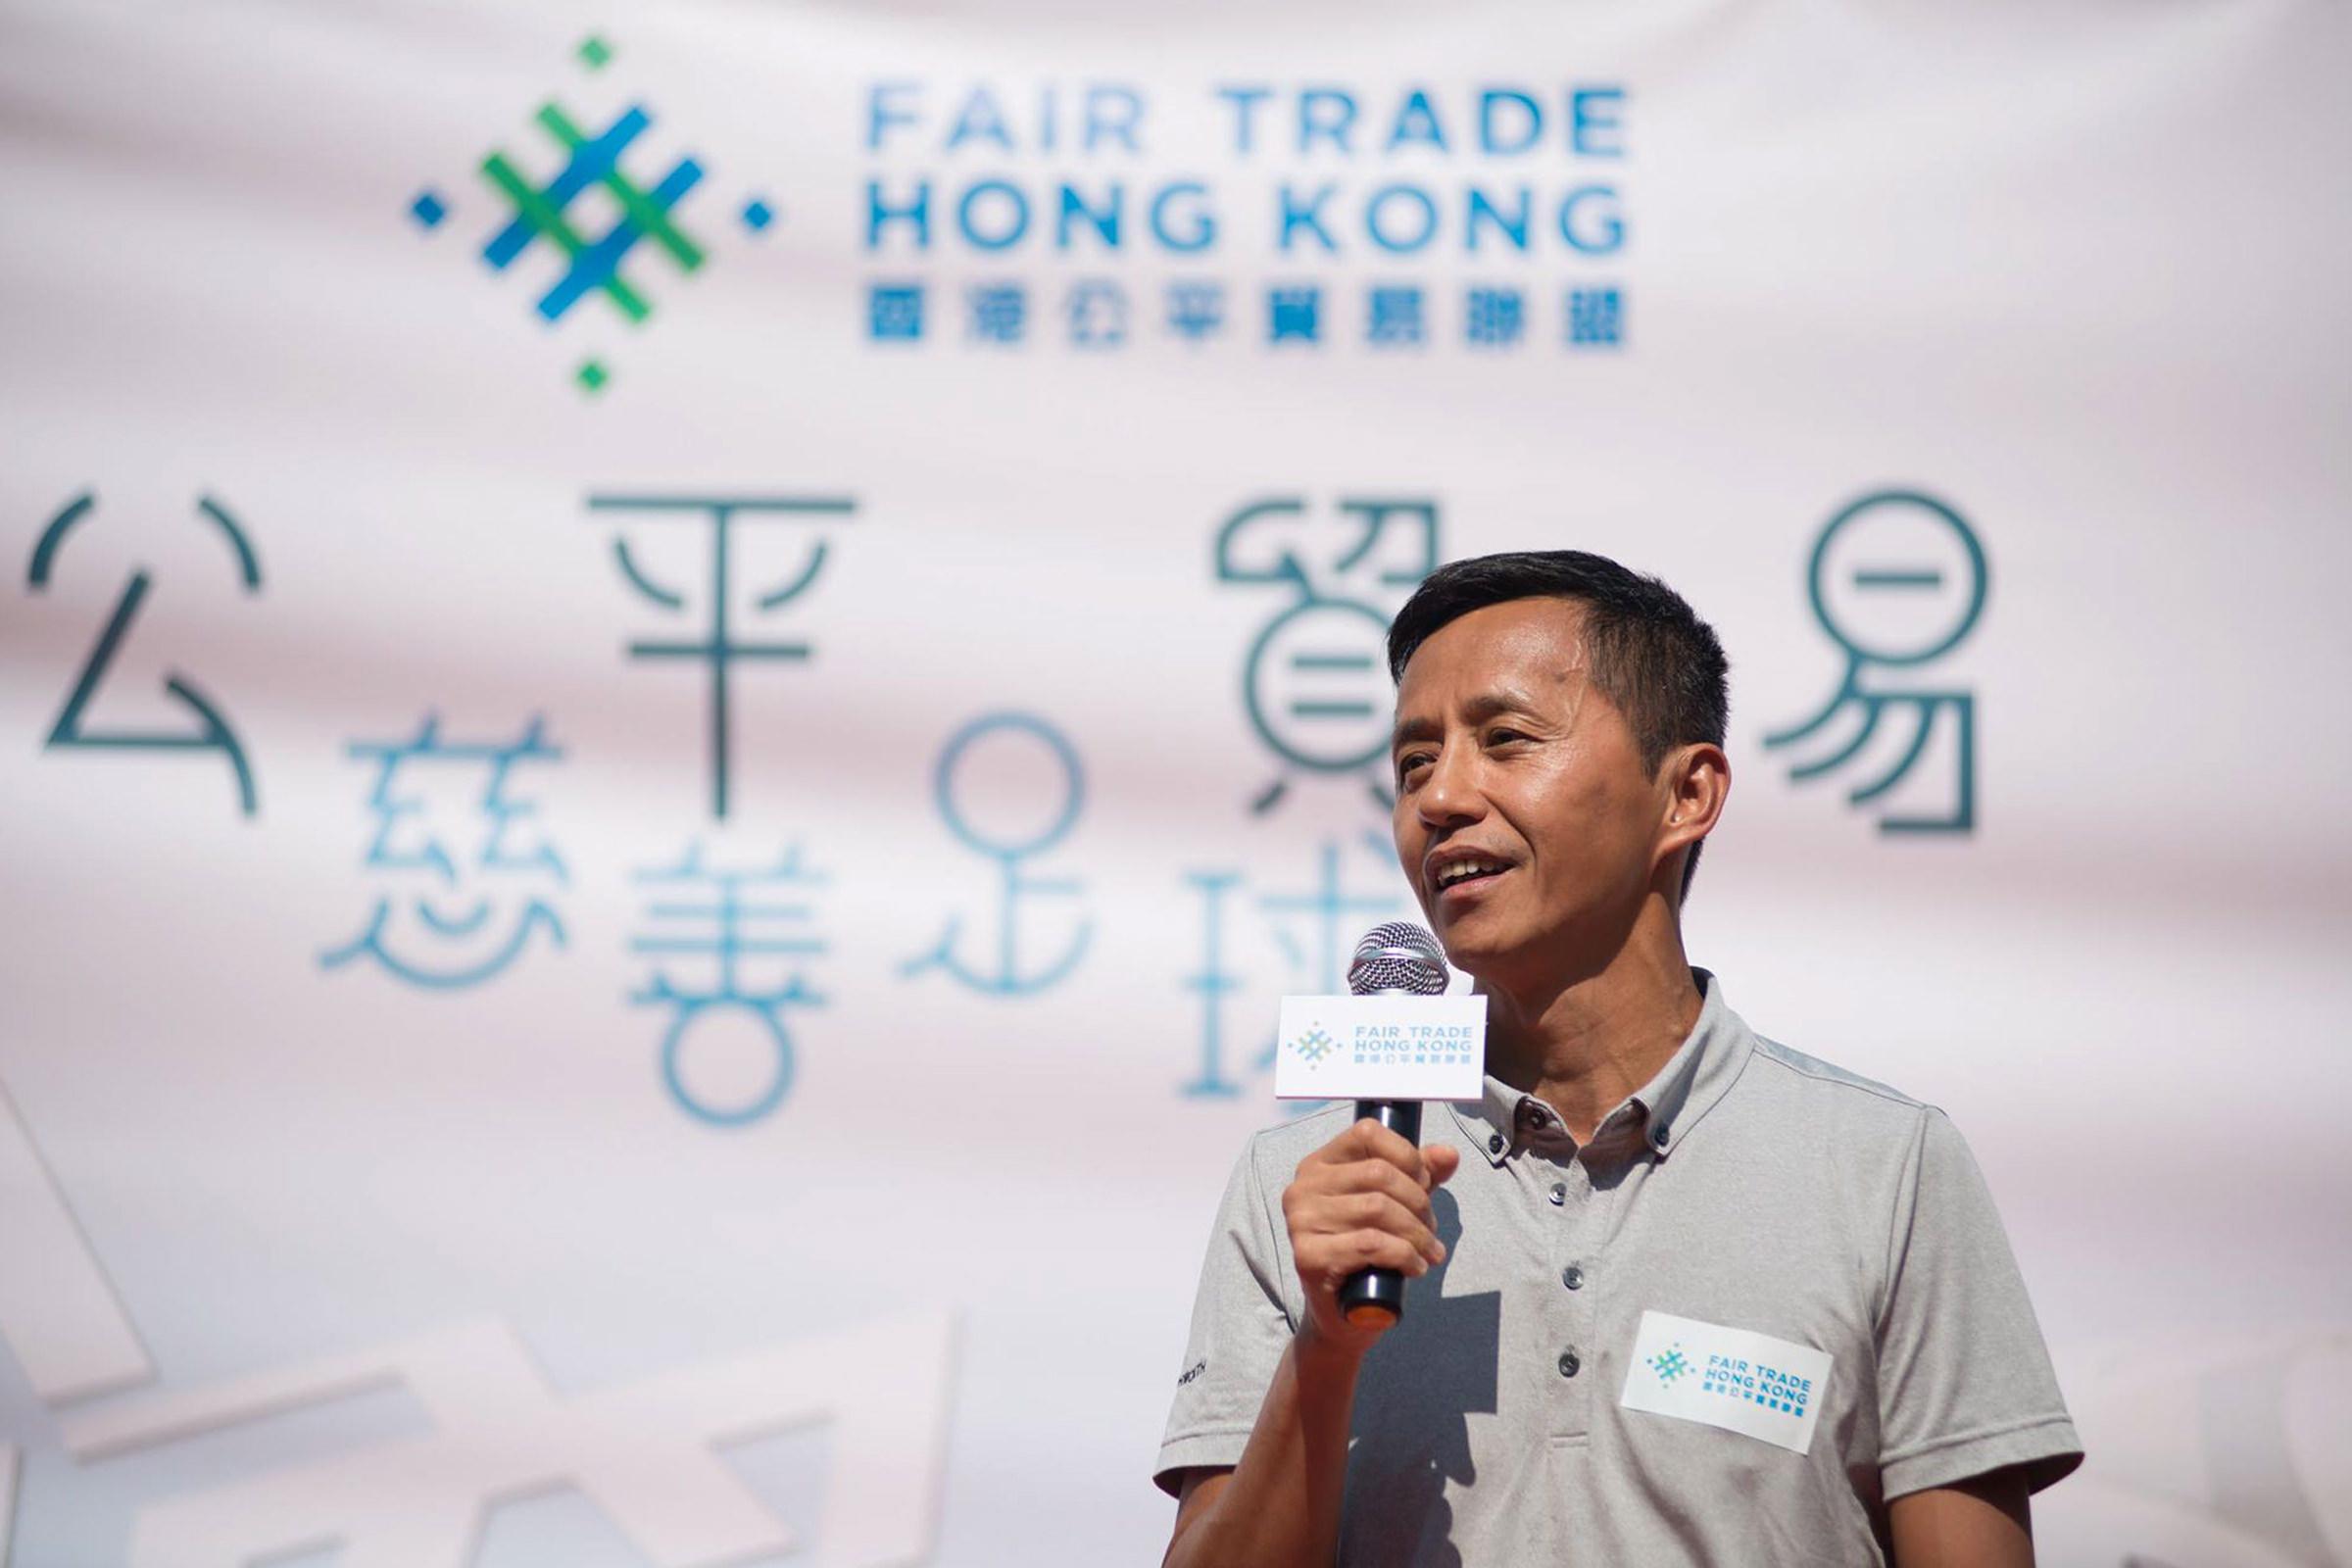 fairtrade_branding_010.jpg